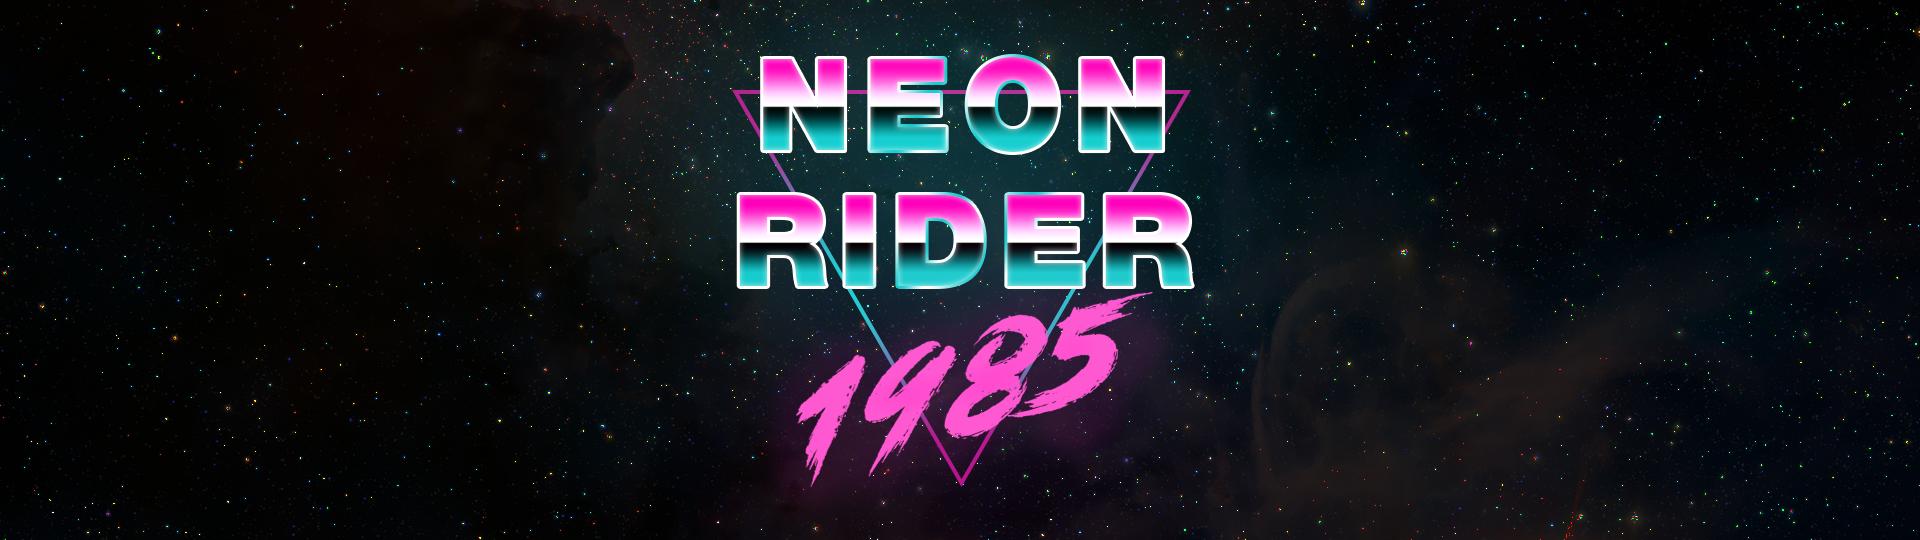 Neon Rider 1985